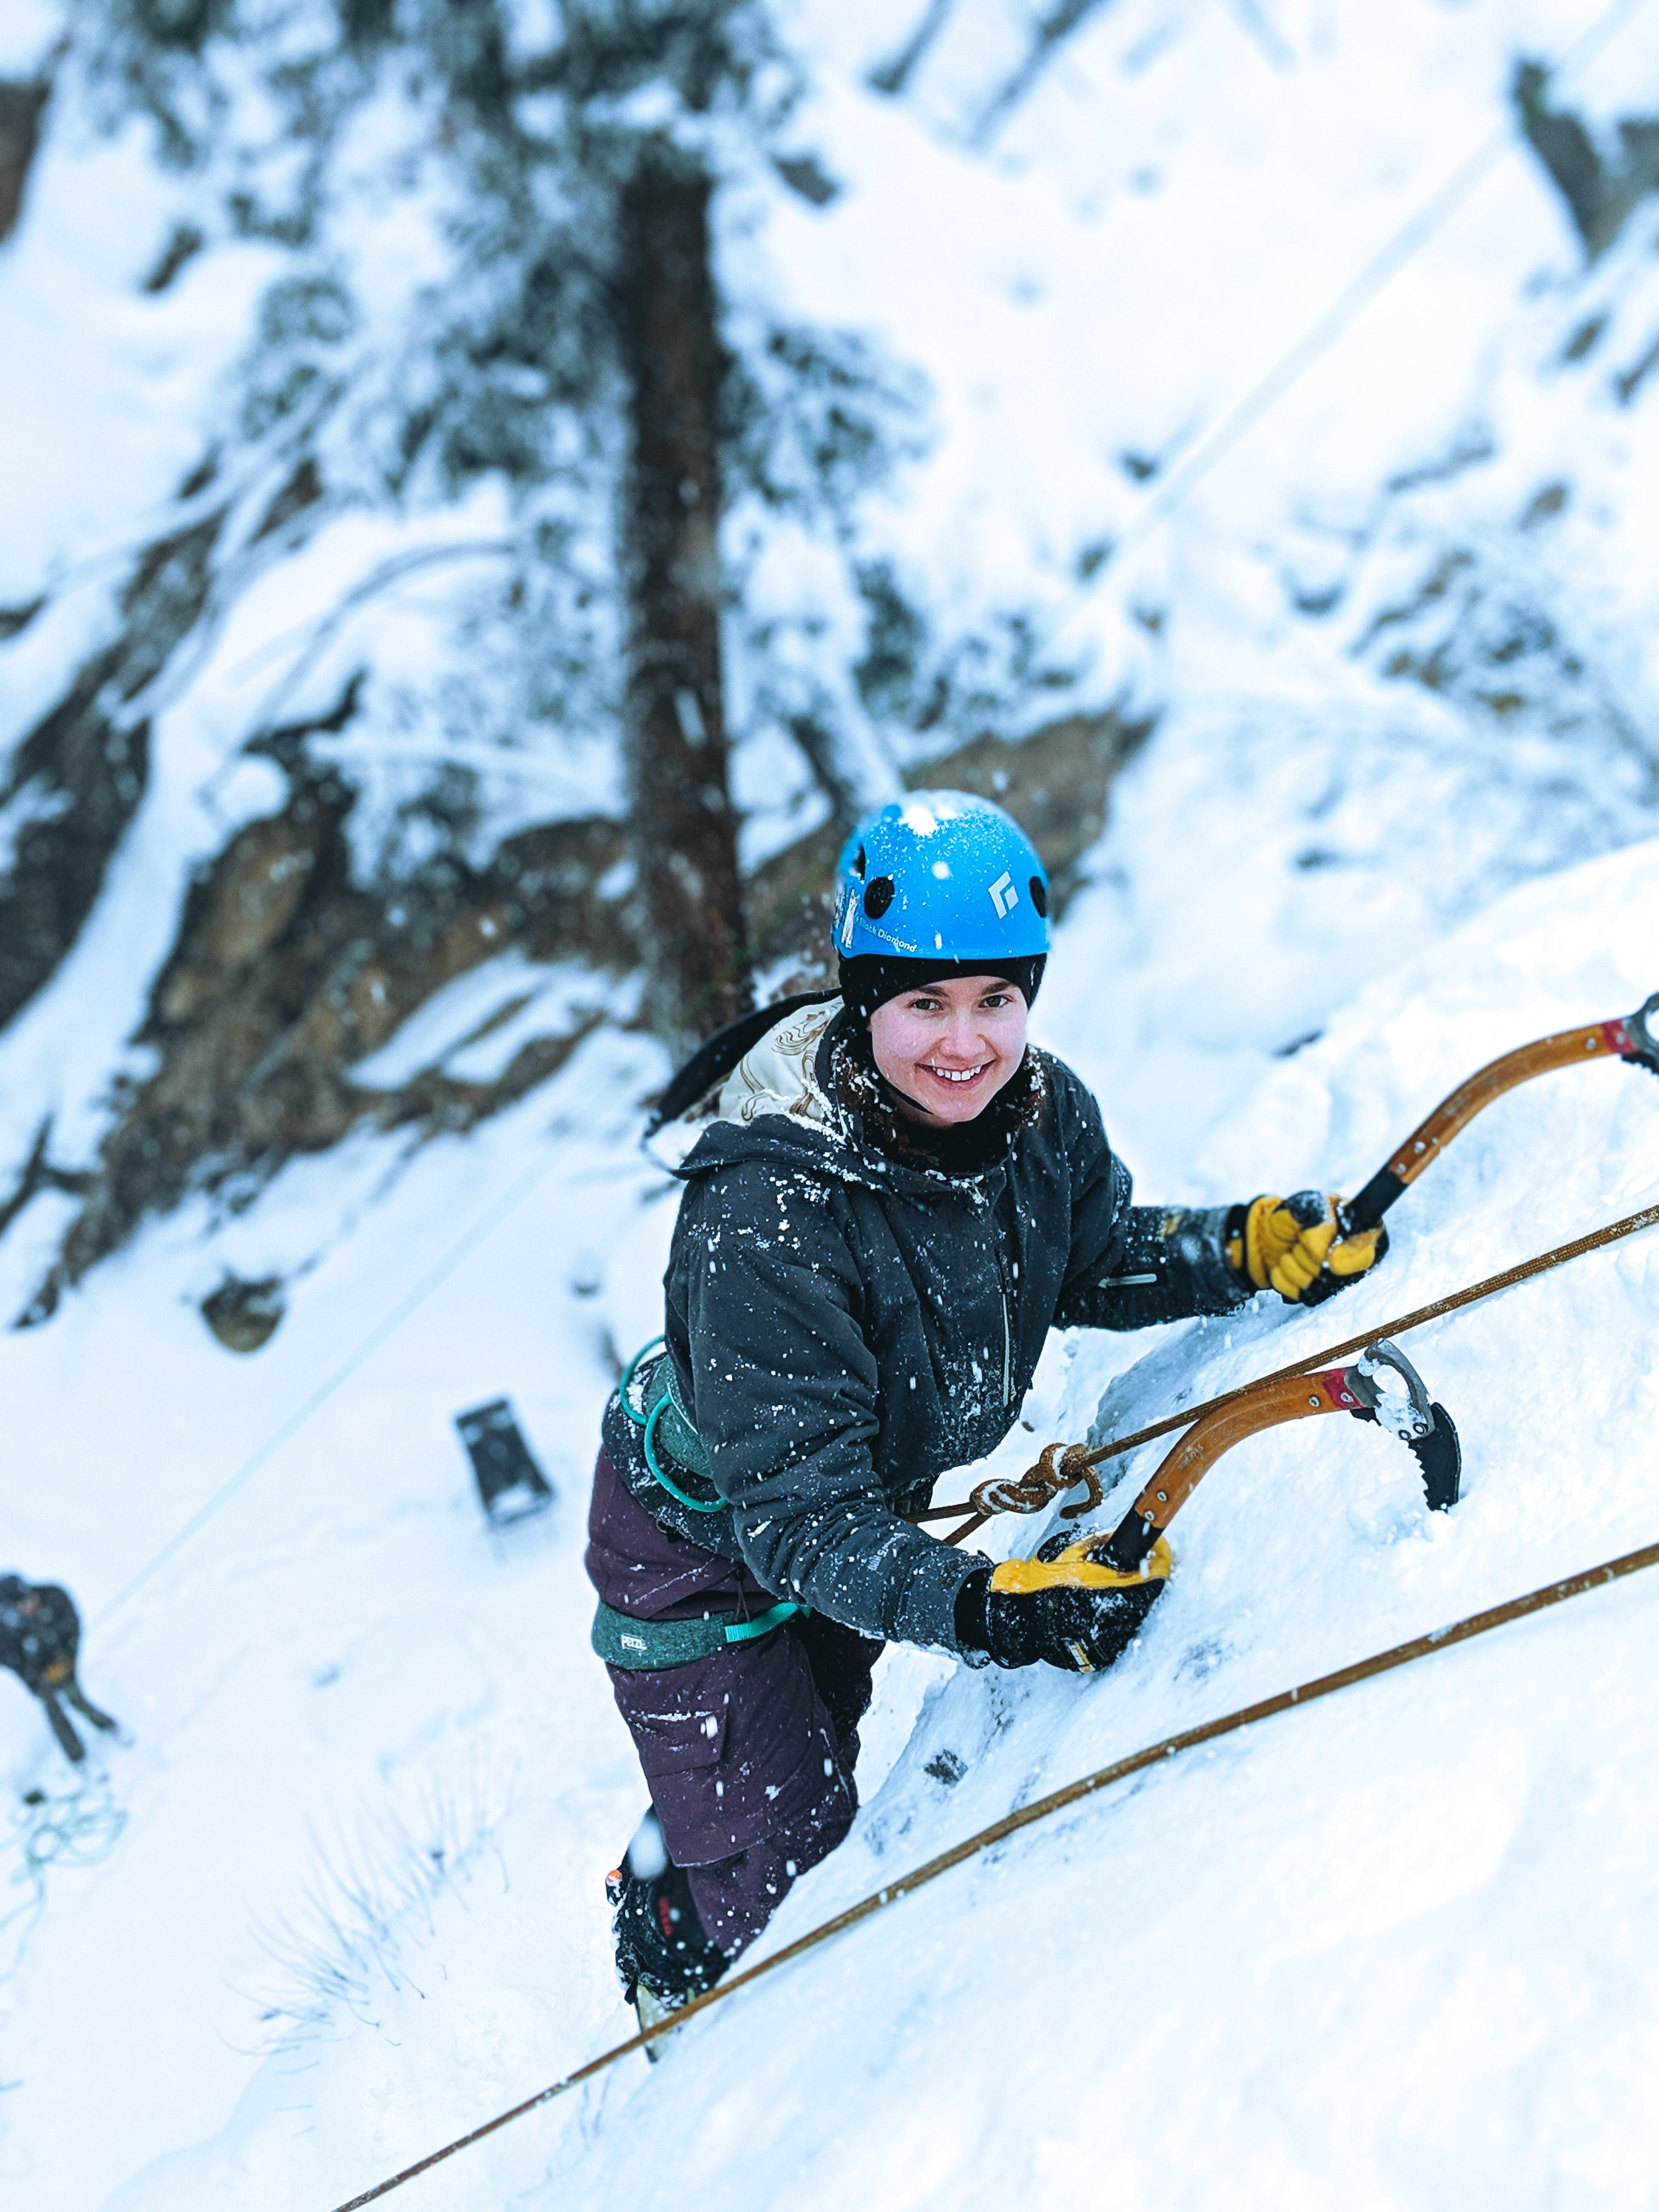 Girl Climbing Snowy Mountain Using Snow Hooks